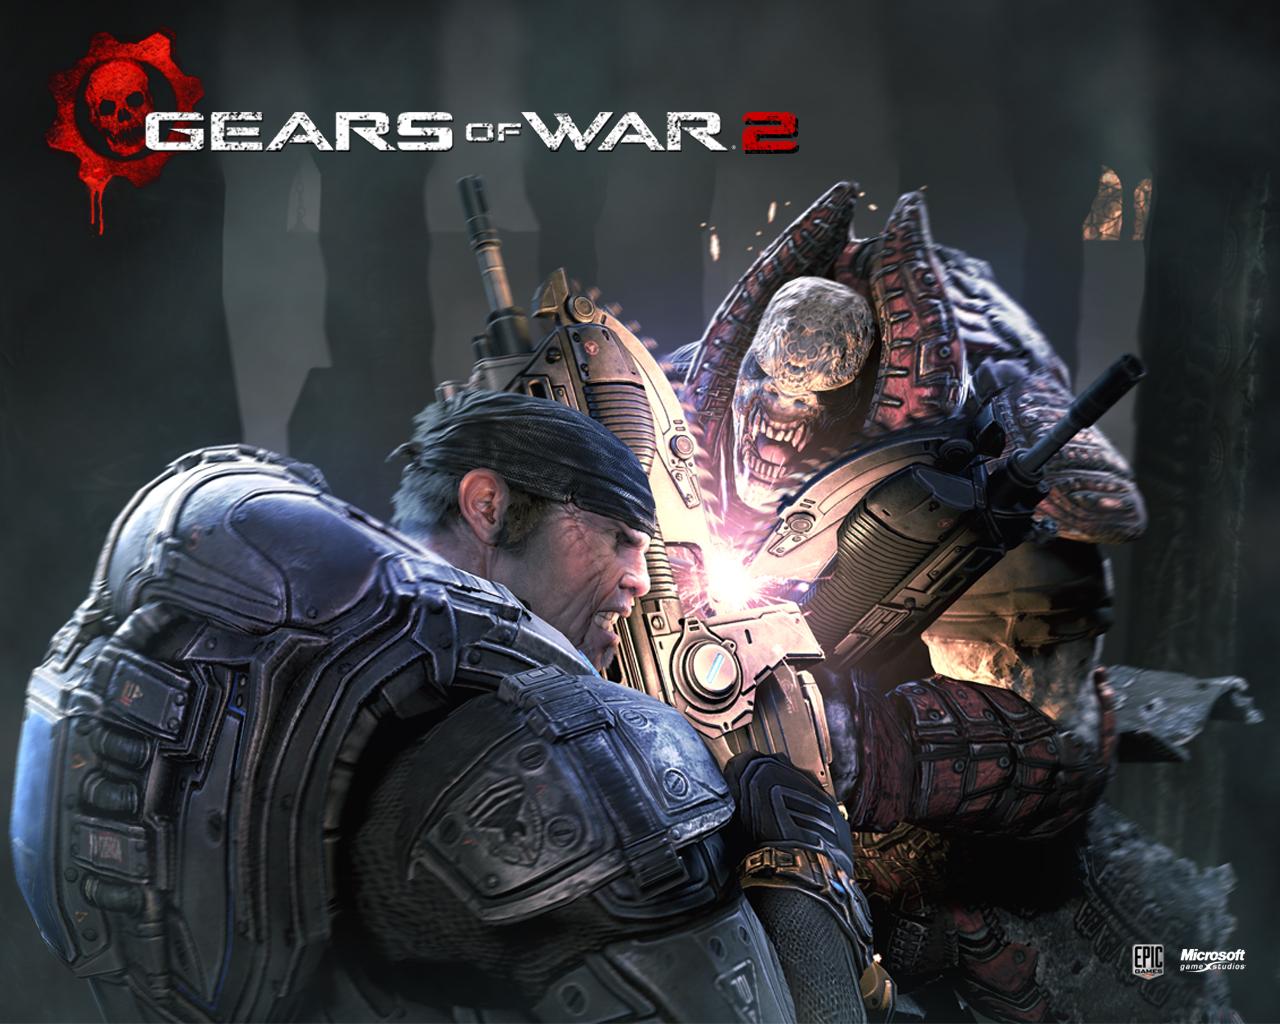 http://4.bp.blogspot.com/-ubEuym0dW24/TdBJmJe656I/AAAAAAAABrw/kUpPMf5D4xo/s1600/gear_of_war_.jpg